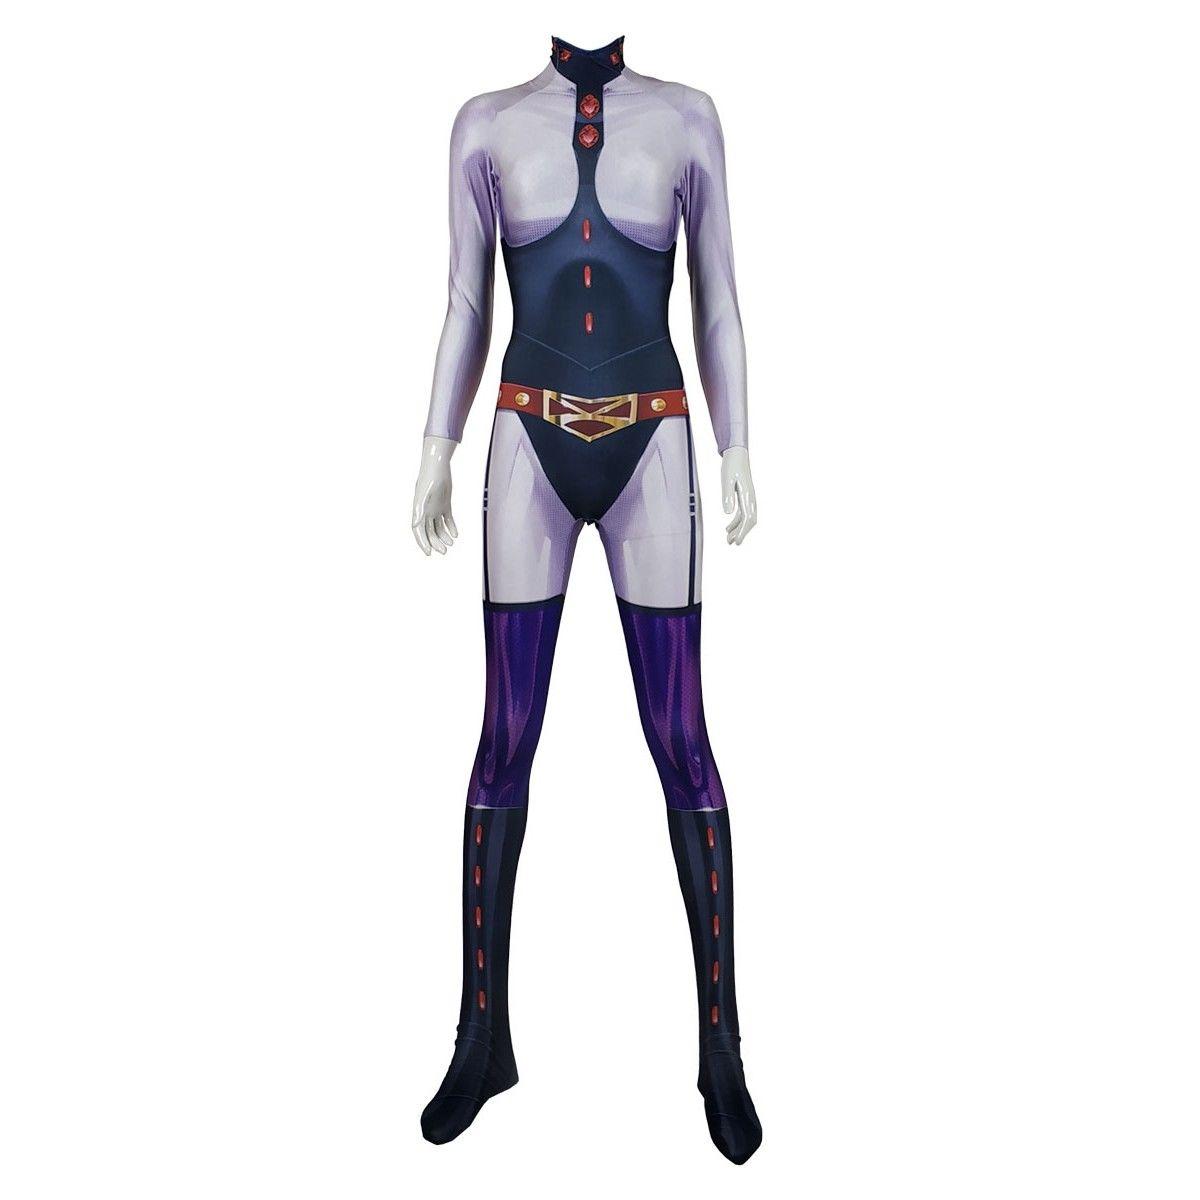 Cosplay Anime My Boku no Hero Academia Midnight  Suit Zentai Jumpsuit Halloween Costume Bodysuit Custom Made